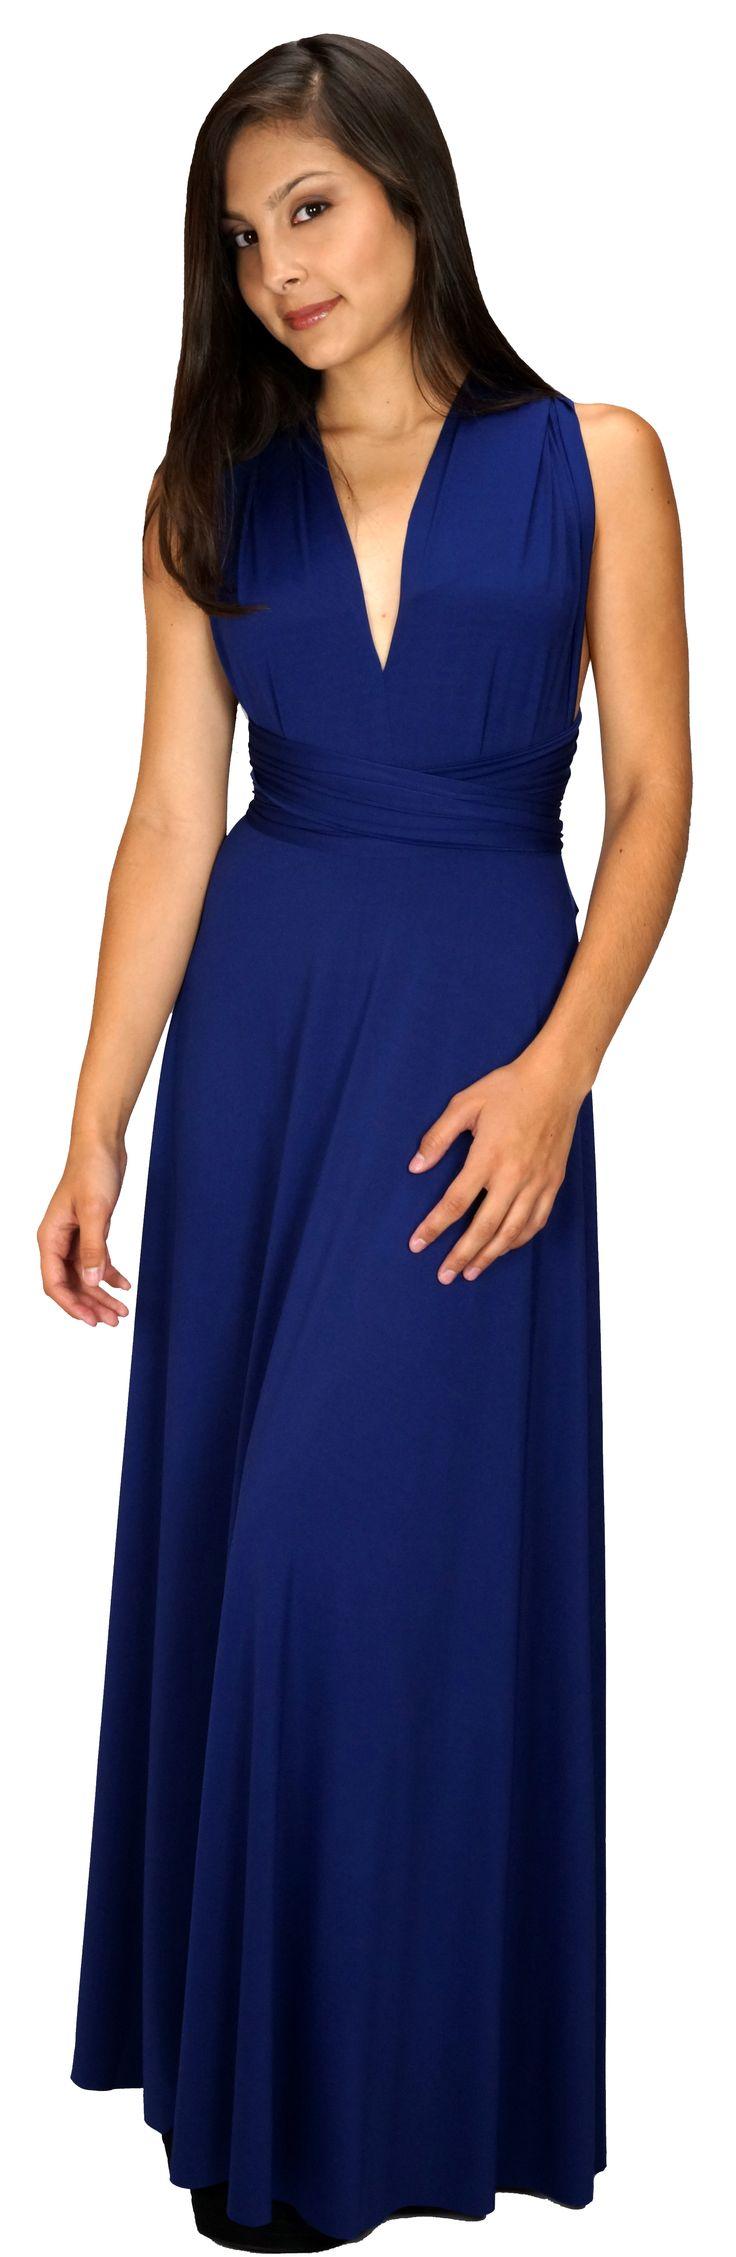 Navy Blue Convertible Bridesmaid Dress long full Length